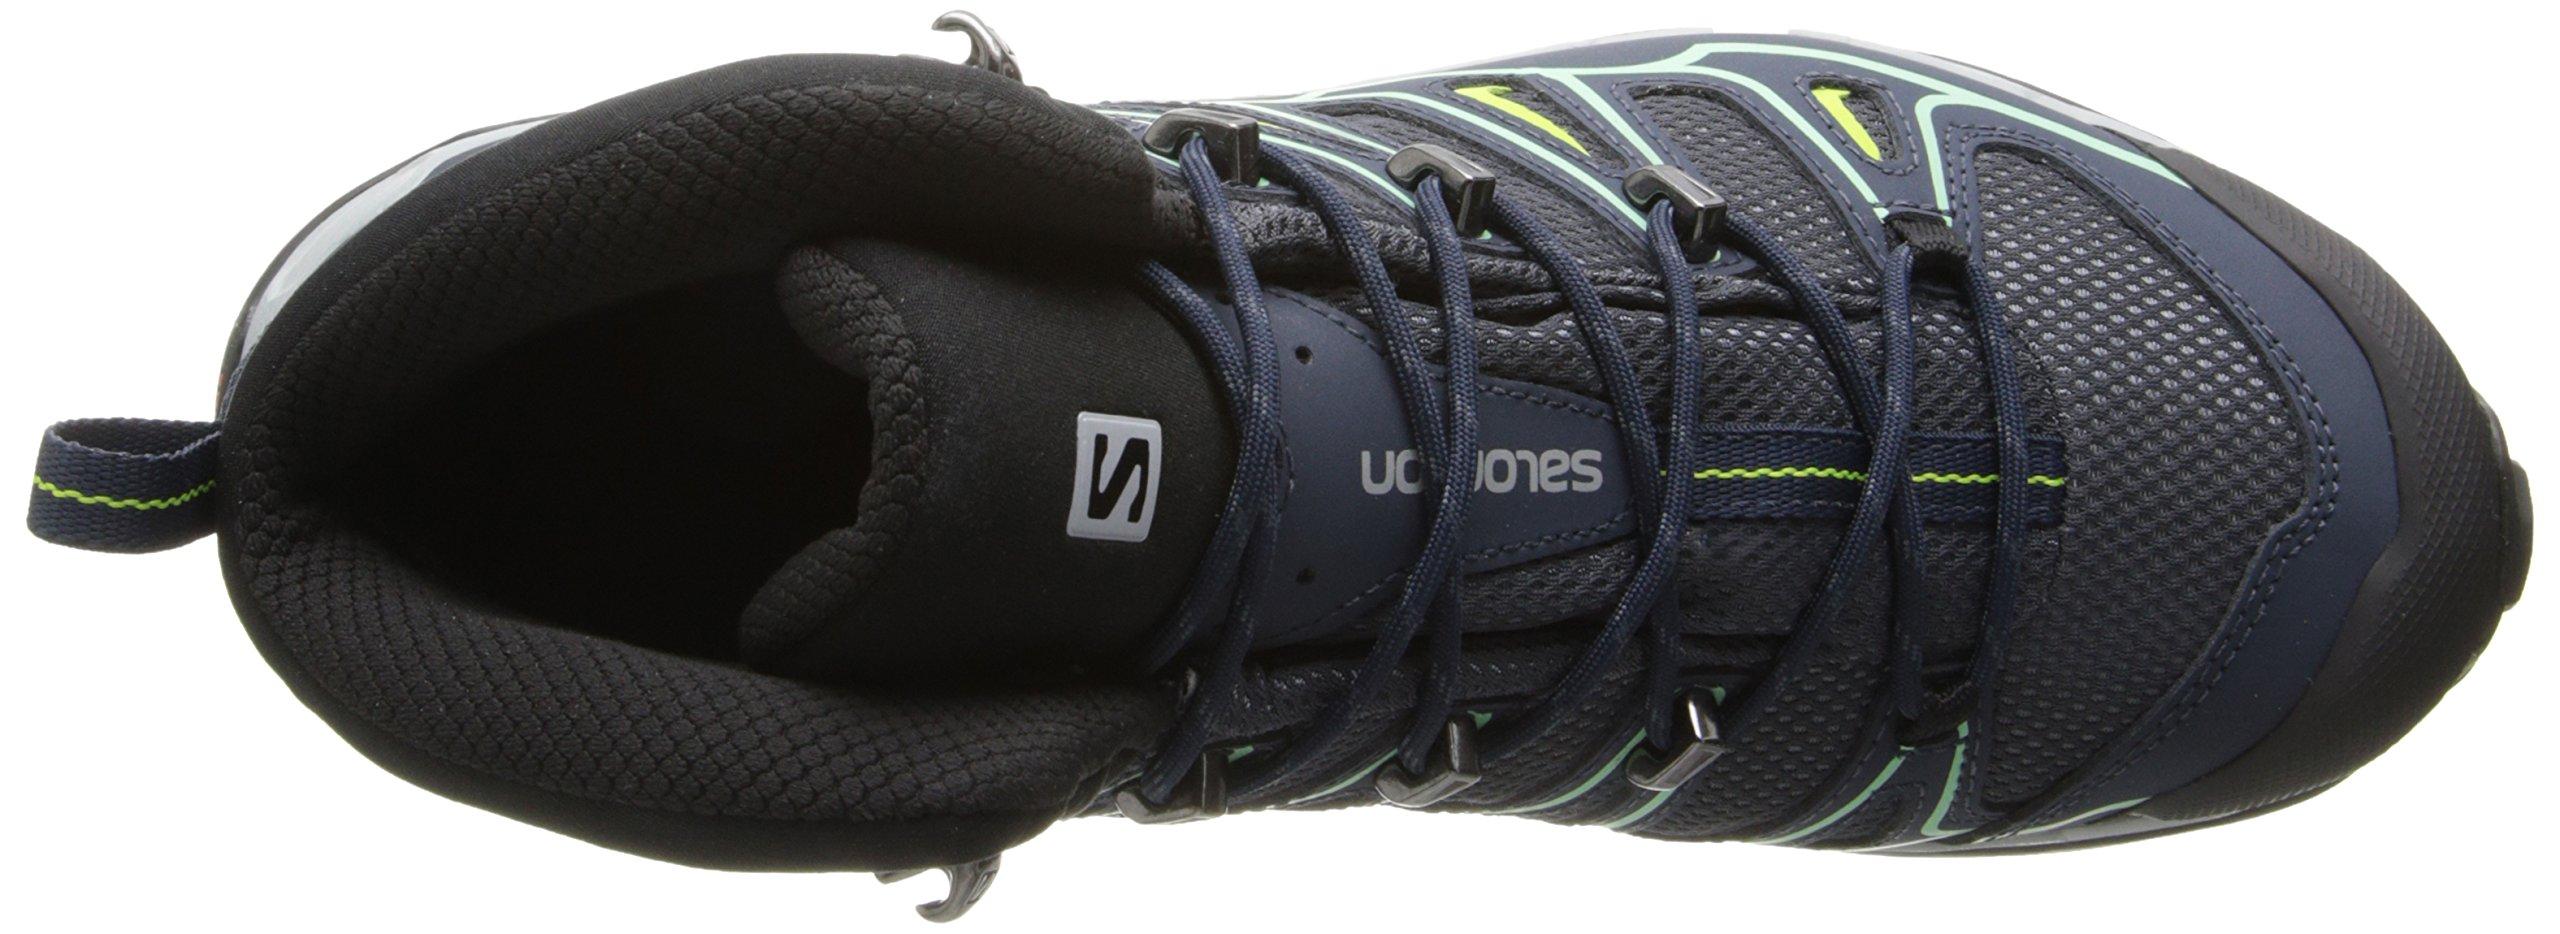 Salomon Women's X Ultra Mid 2 GTX Hiking Shoe, Grey Denim/Deep Blue/Lucite Green, 9 M US by Salomon (Image #8)